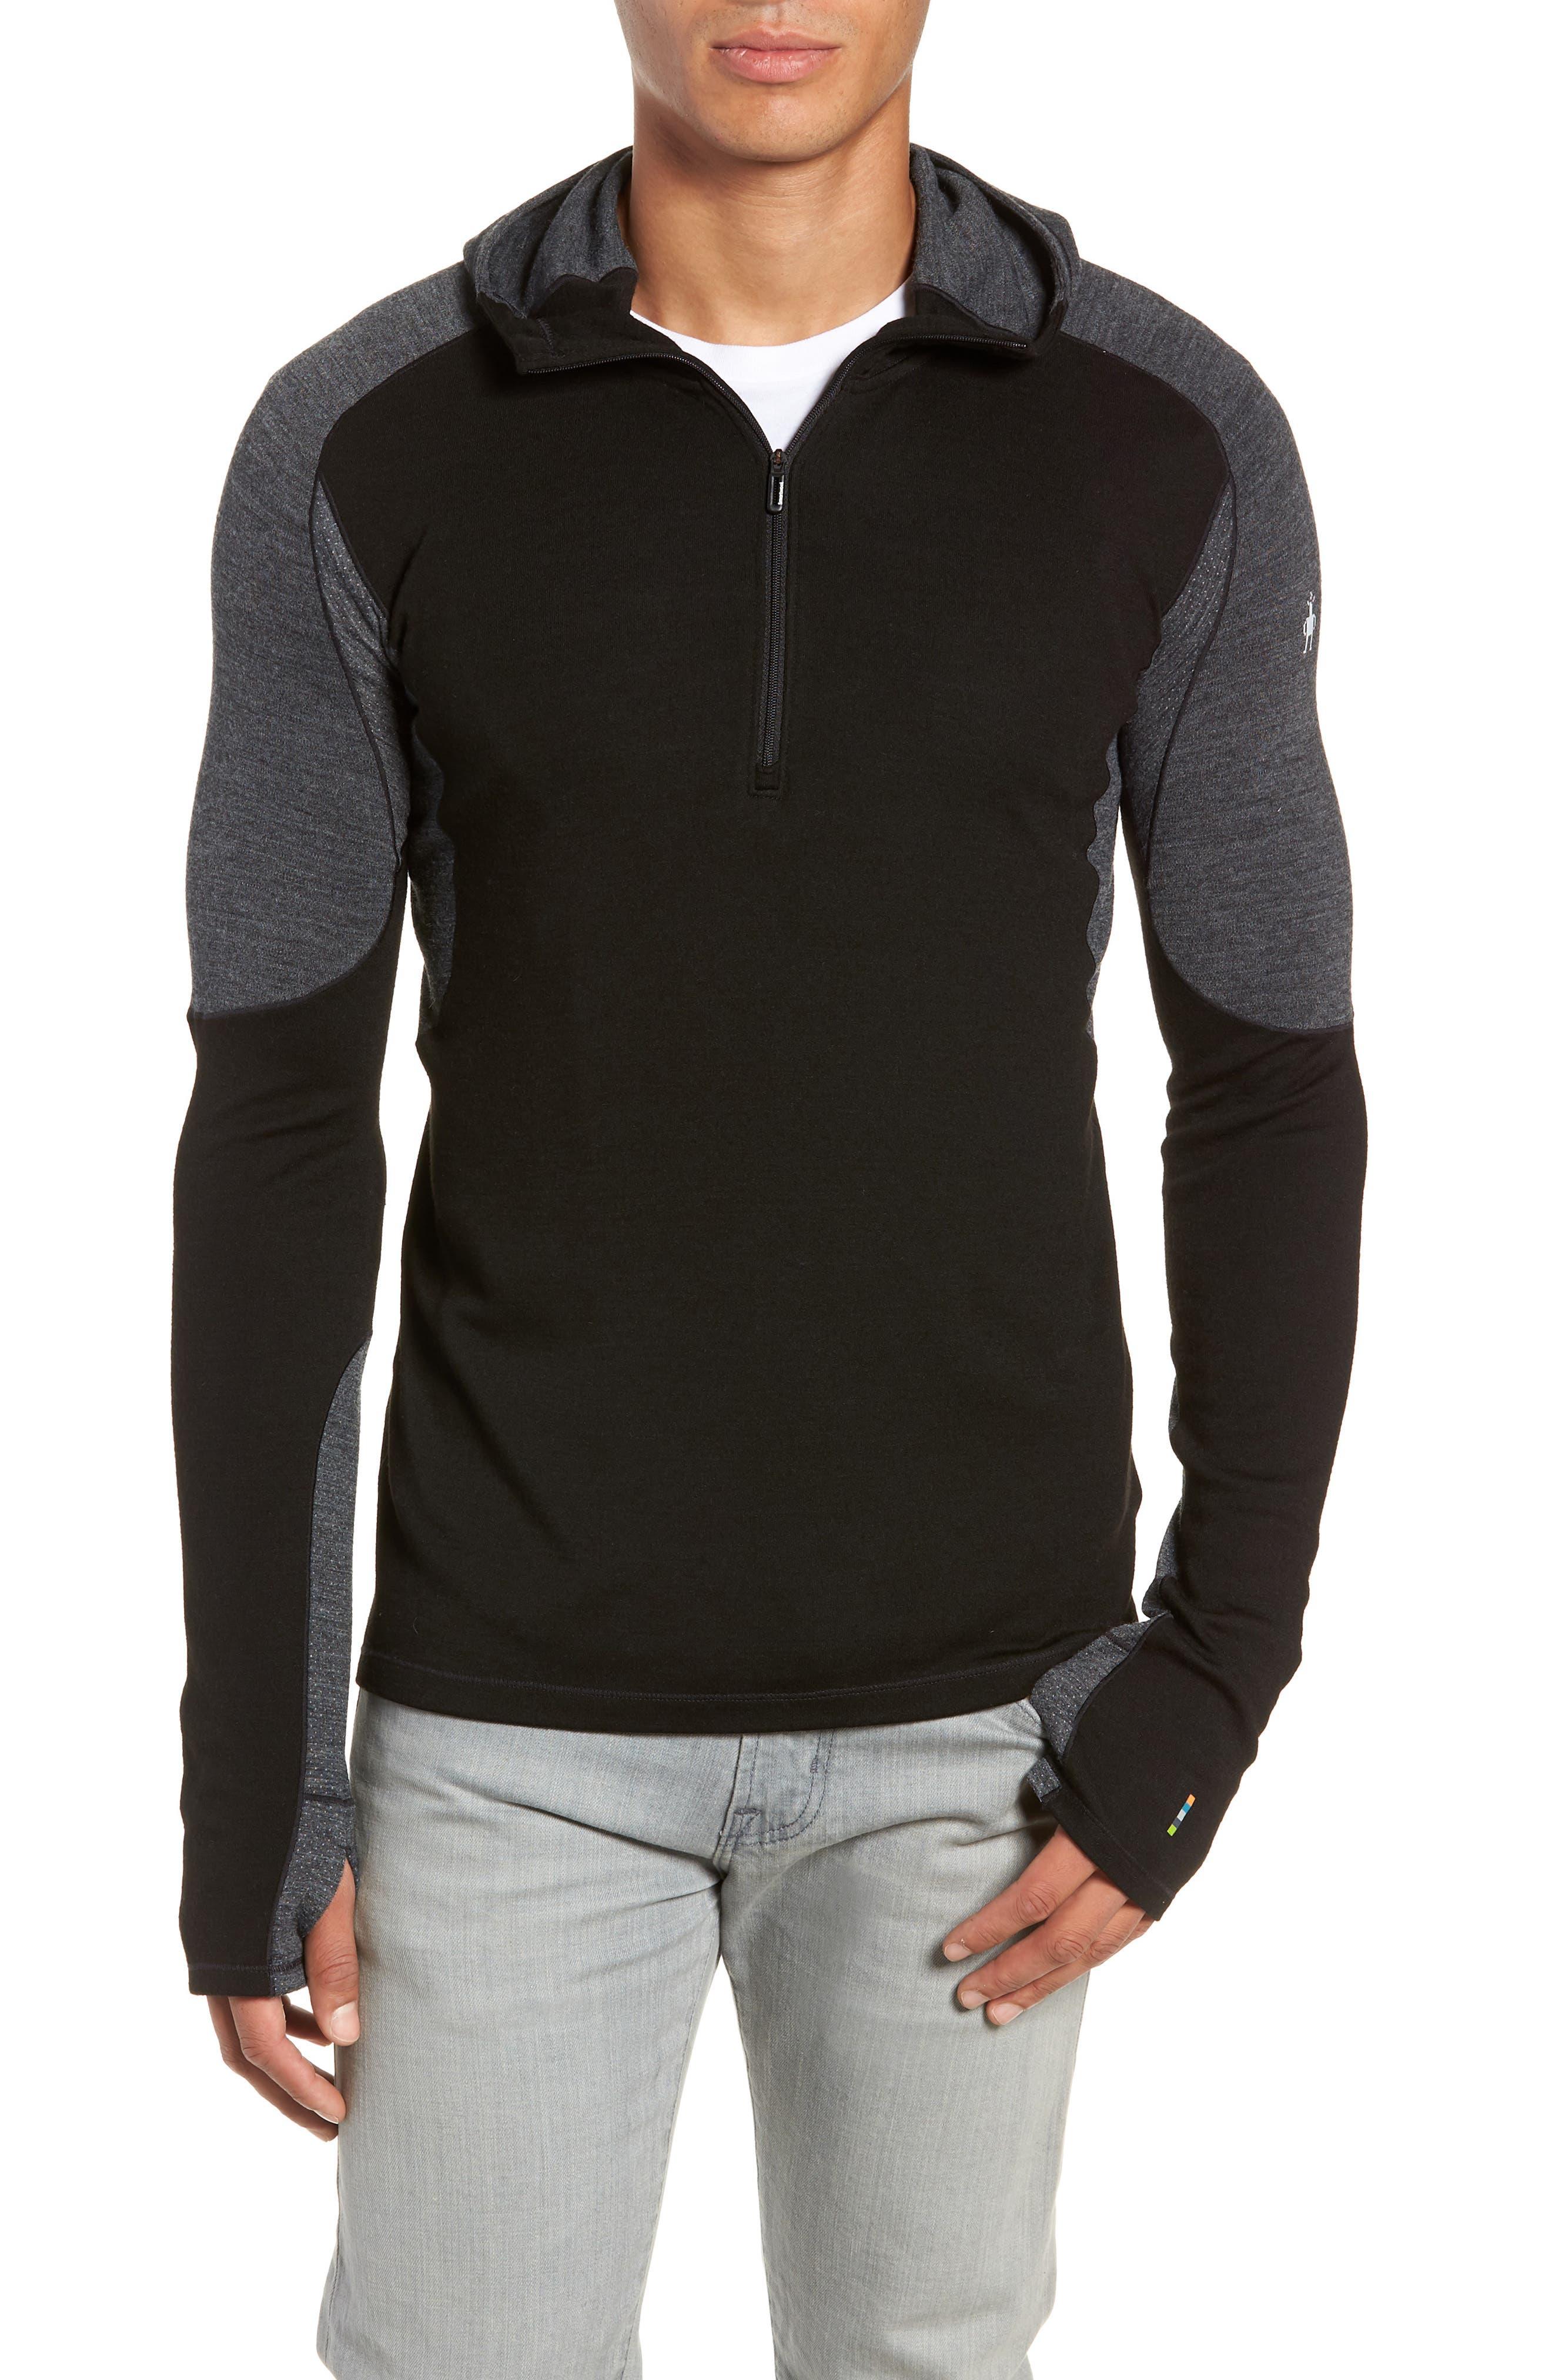 PhD<sup>®</sup> Light Merino Wool Blend Hooded Pullover,                             Main thumbnail 1, color,                             BLACK